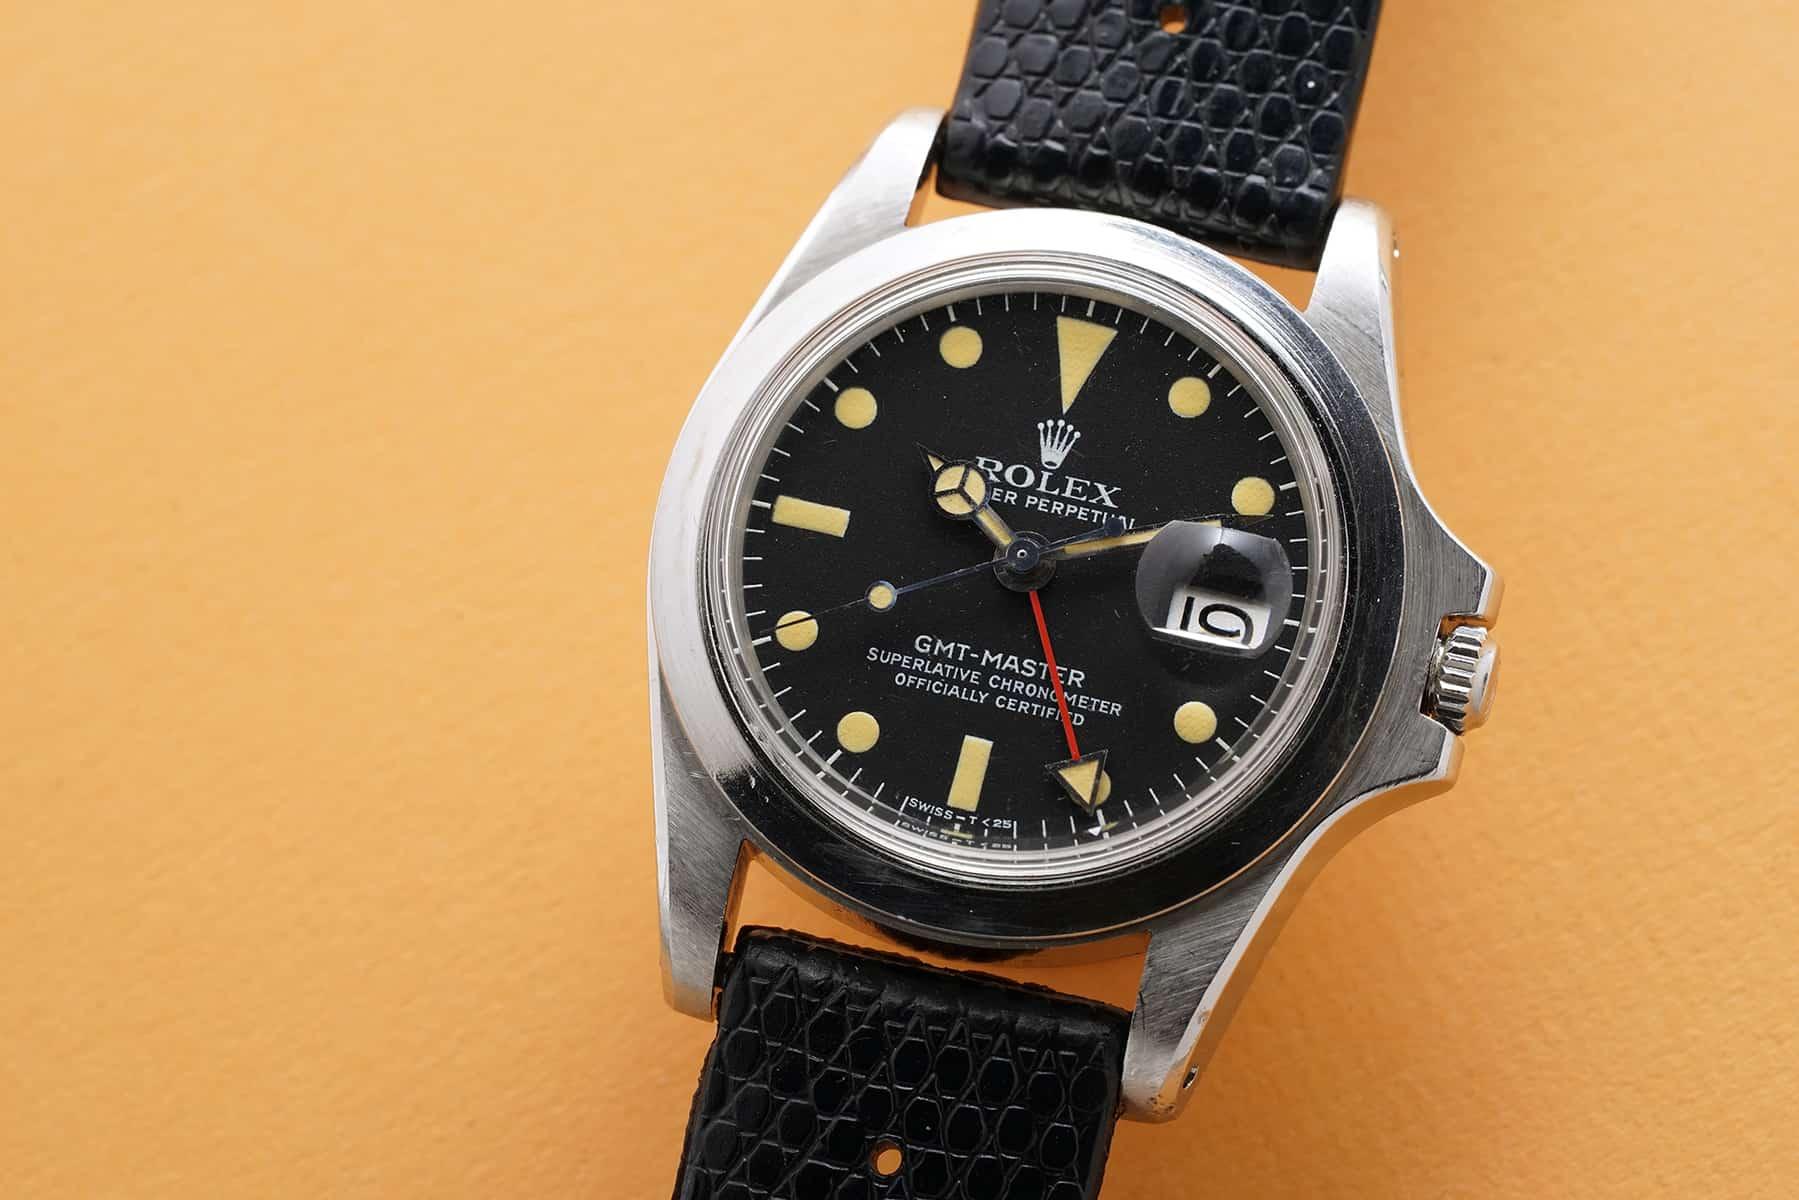 Marlon Brando's Apocalypse Now Rolex GMT-Master